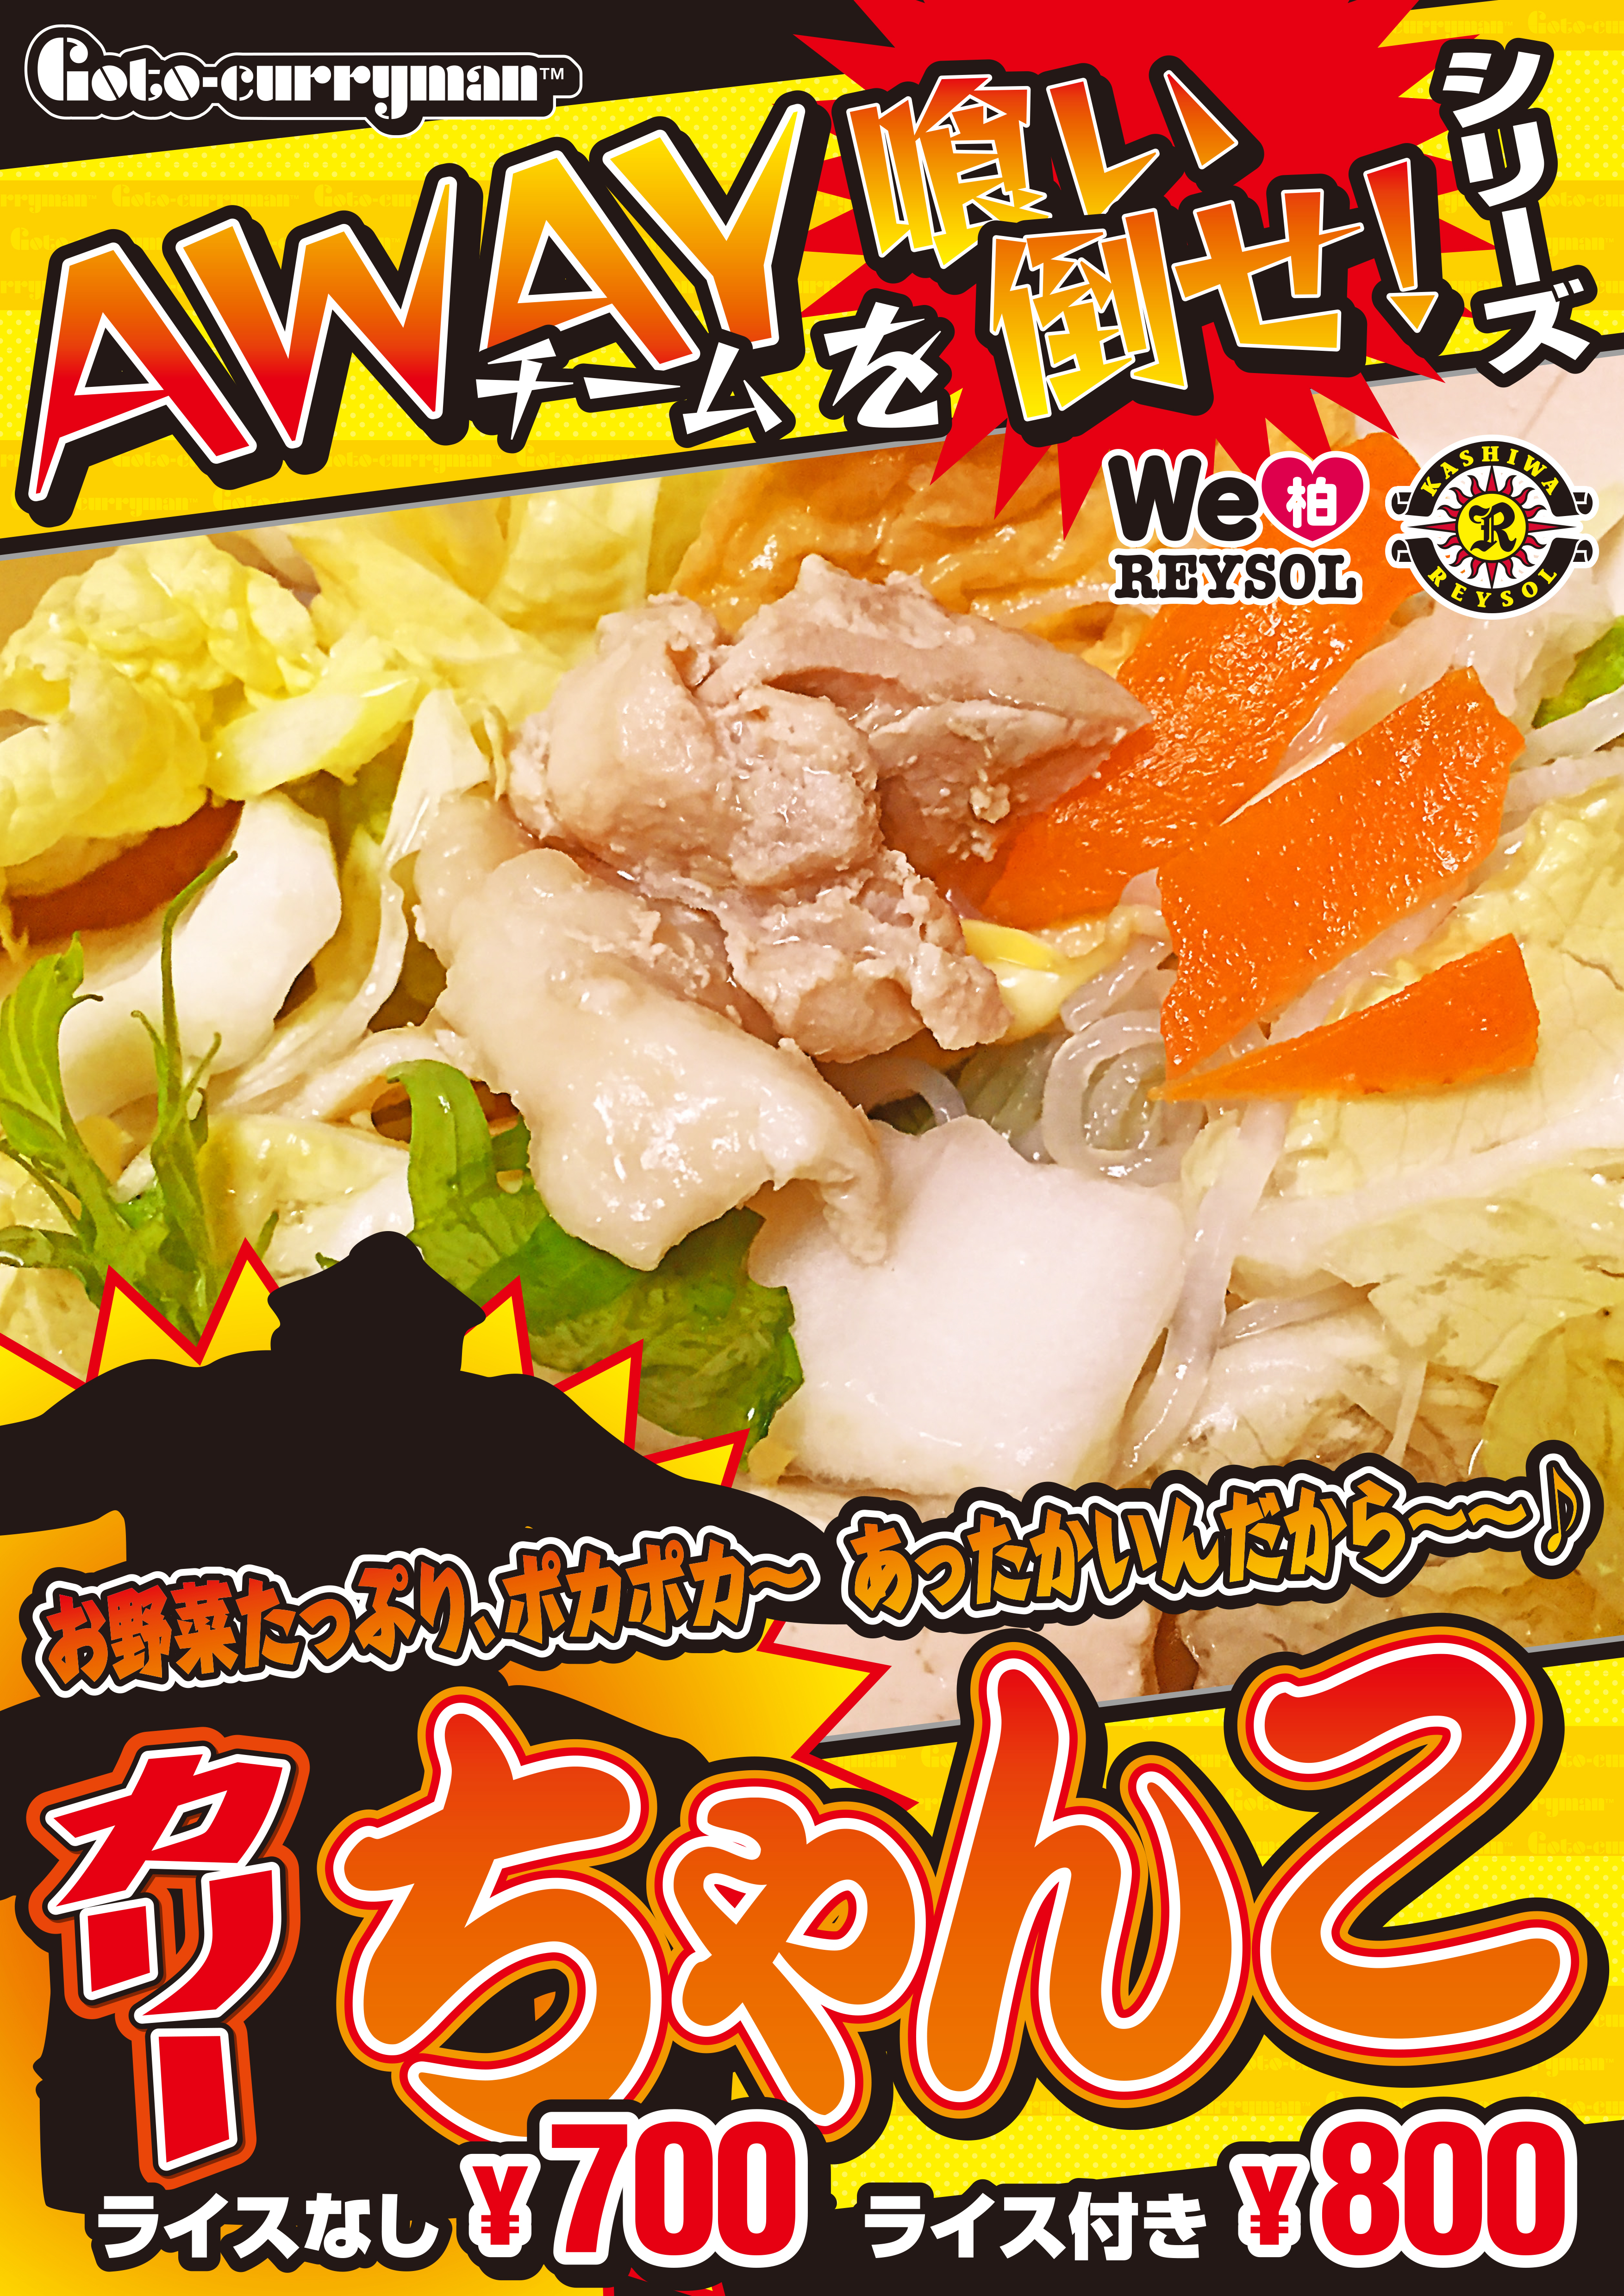 8-cree-chanko.jpg